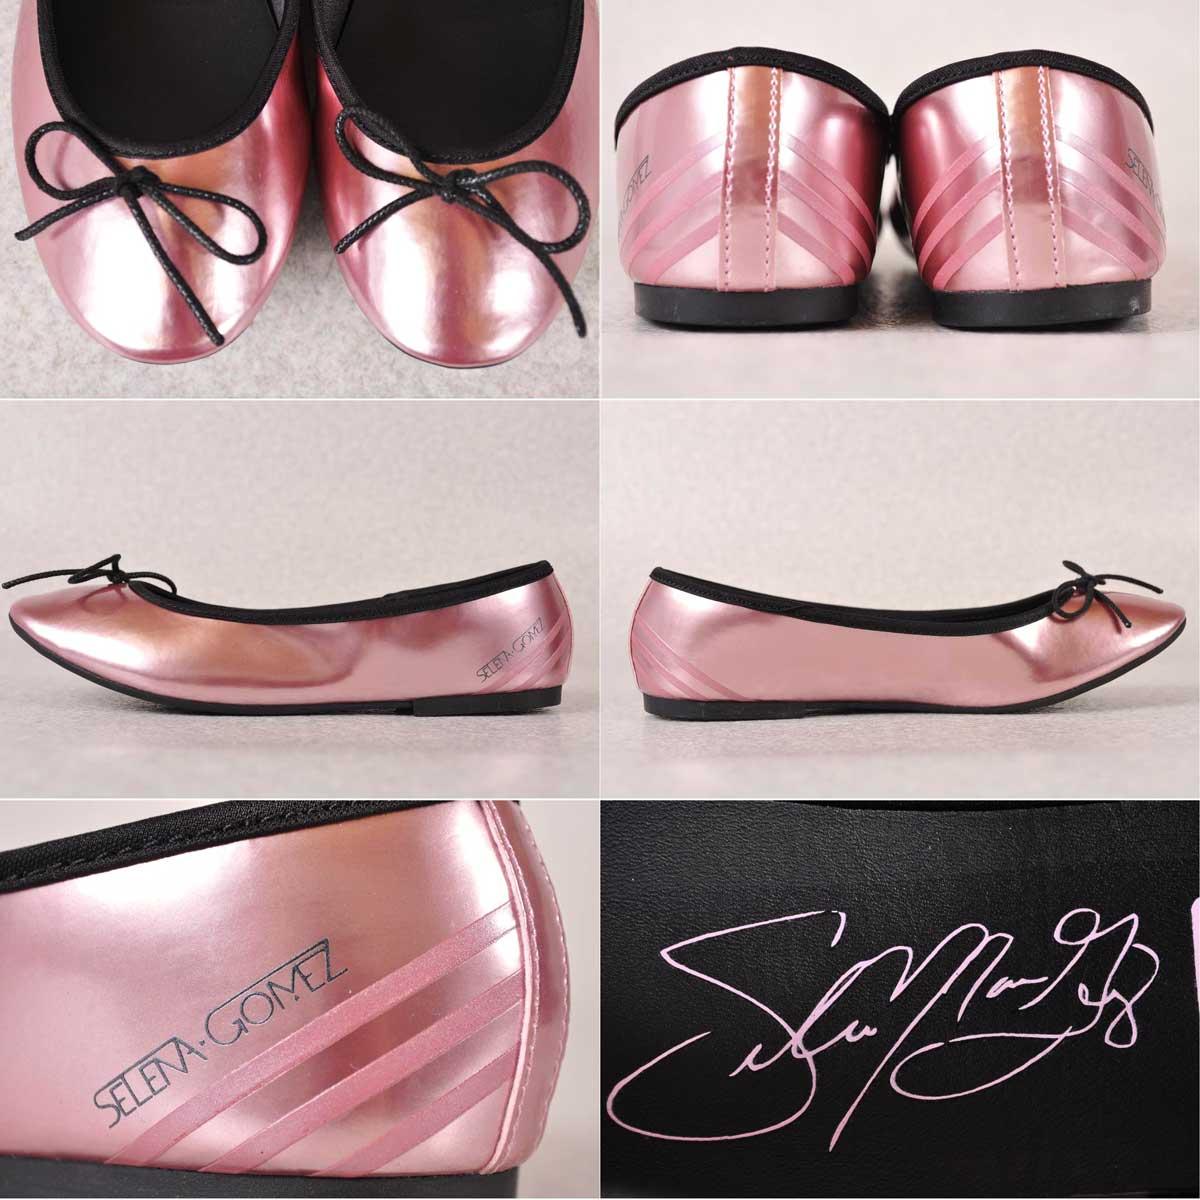 new photos detailed look classic 2013 made / adidas x SELEMA GOMEZ adidas / Selena Gomez / NEOBALLERINA SG  neo ballerina SG / pumpssneaker / metallic pink ▽